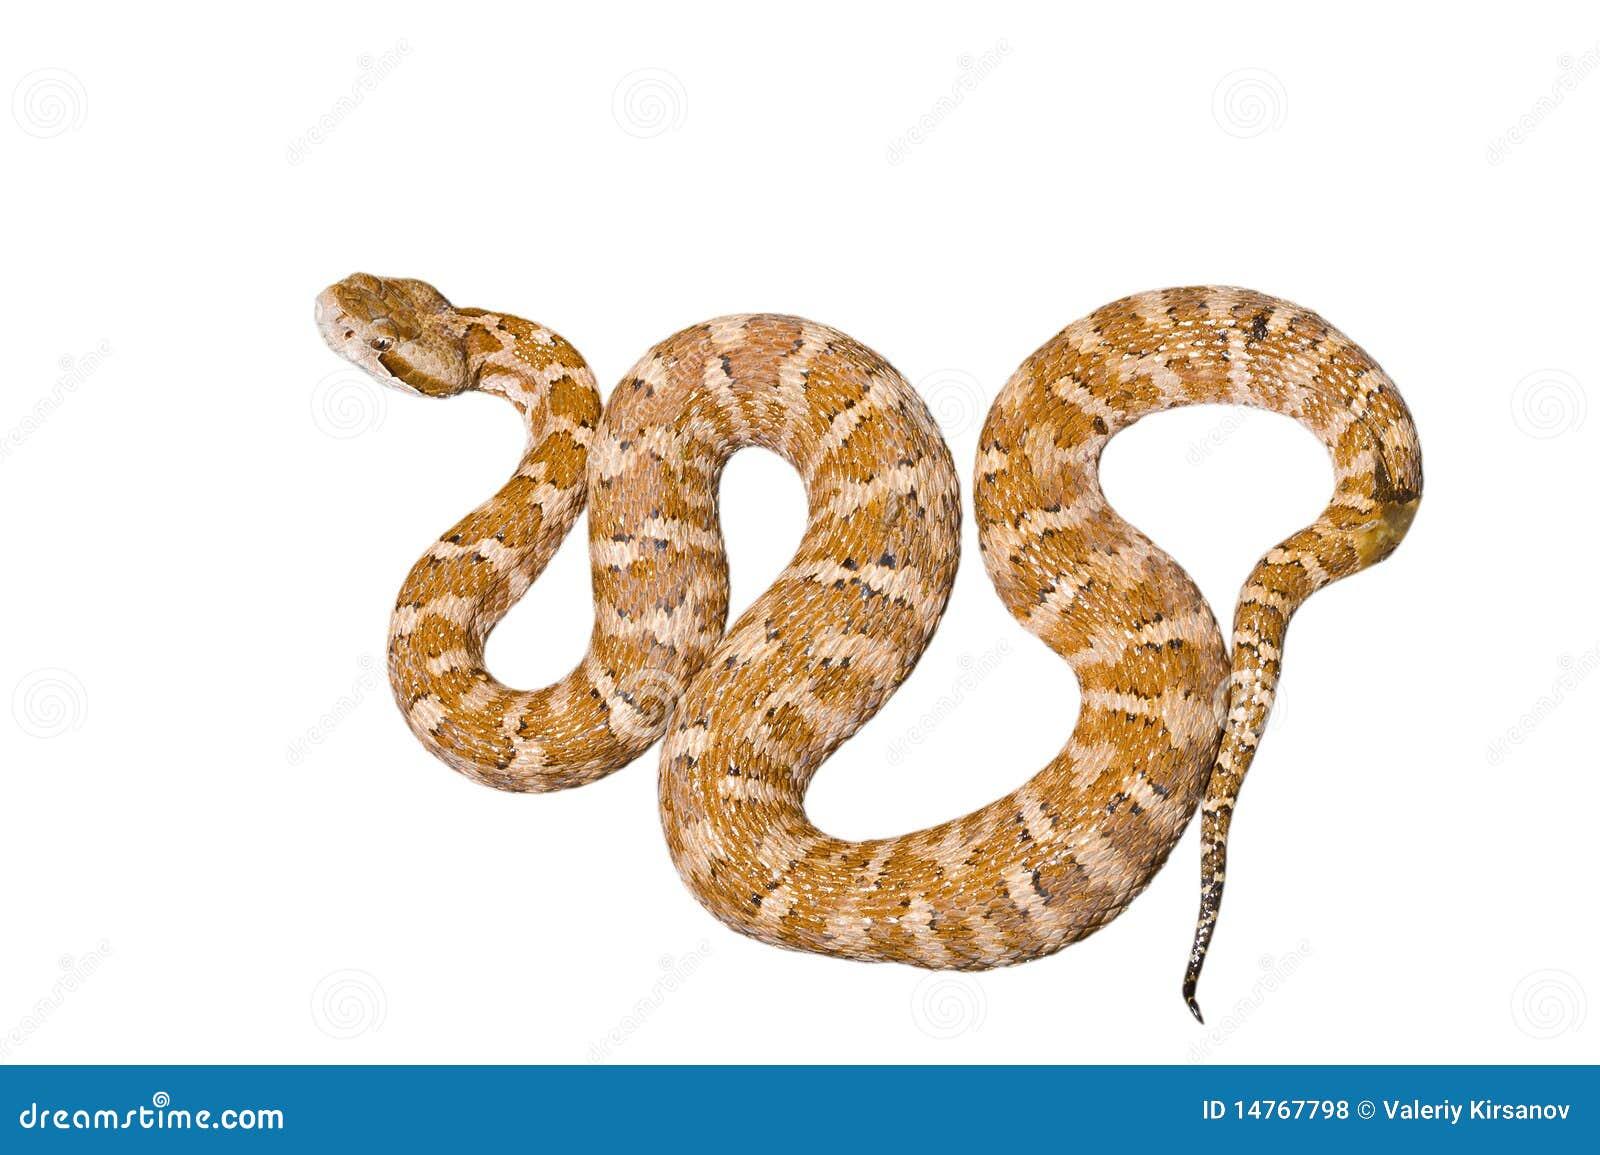 Venomous snake 2